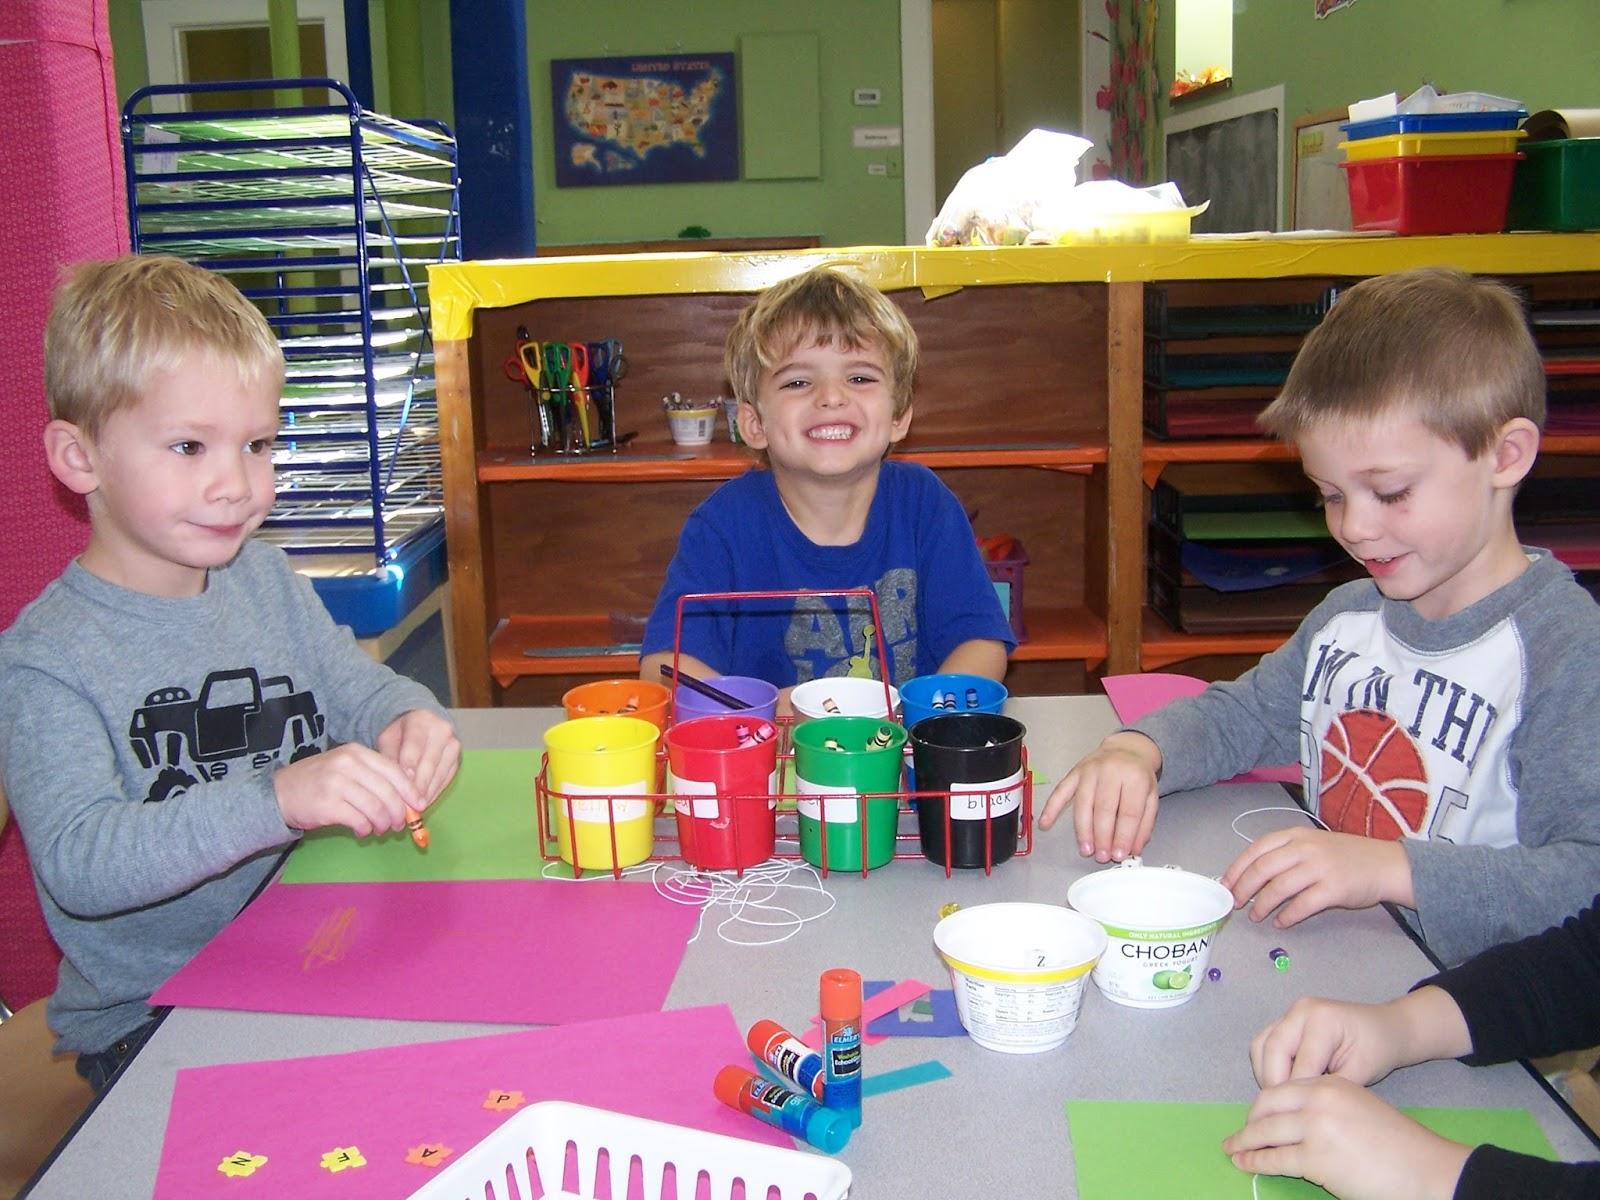 Jack Amp Jill Preschool Registration Tuition